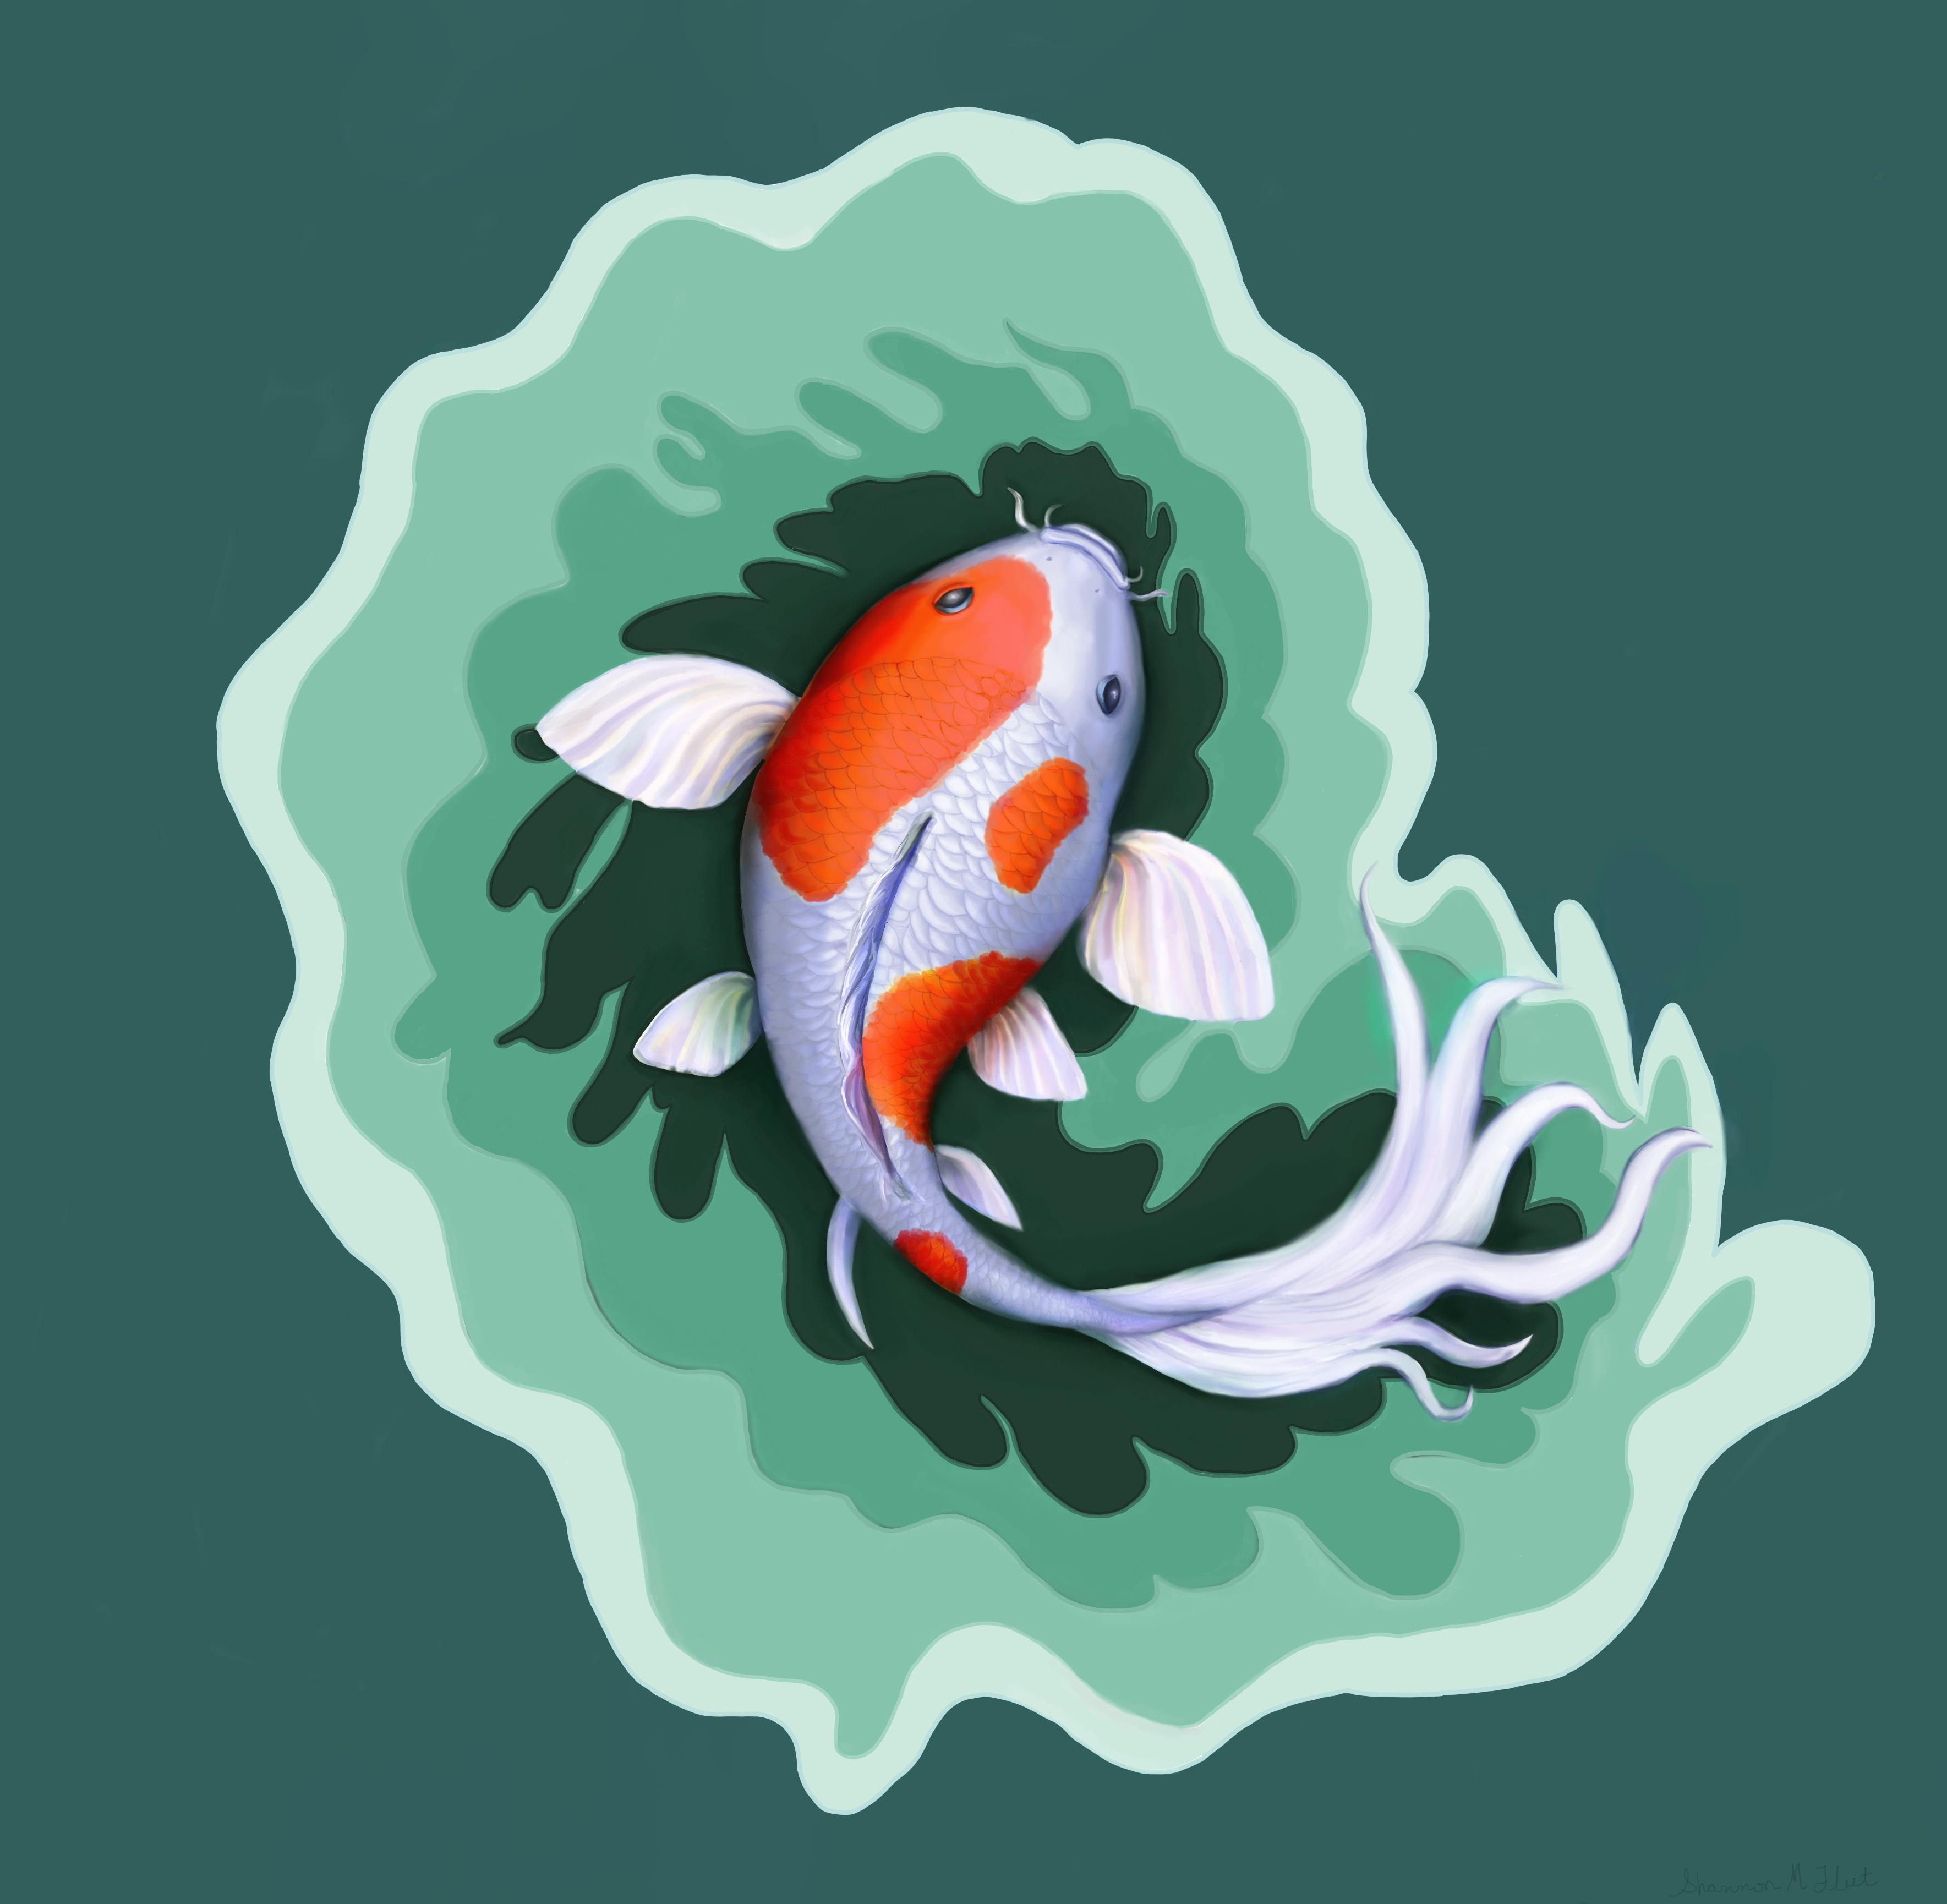 Orange And White Koi Fish Digital Painting By Shannon Fleet Koi Fish Fish Art Fish